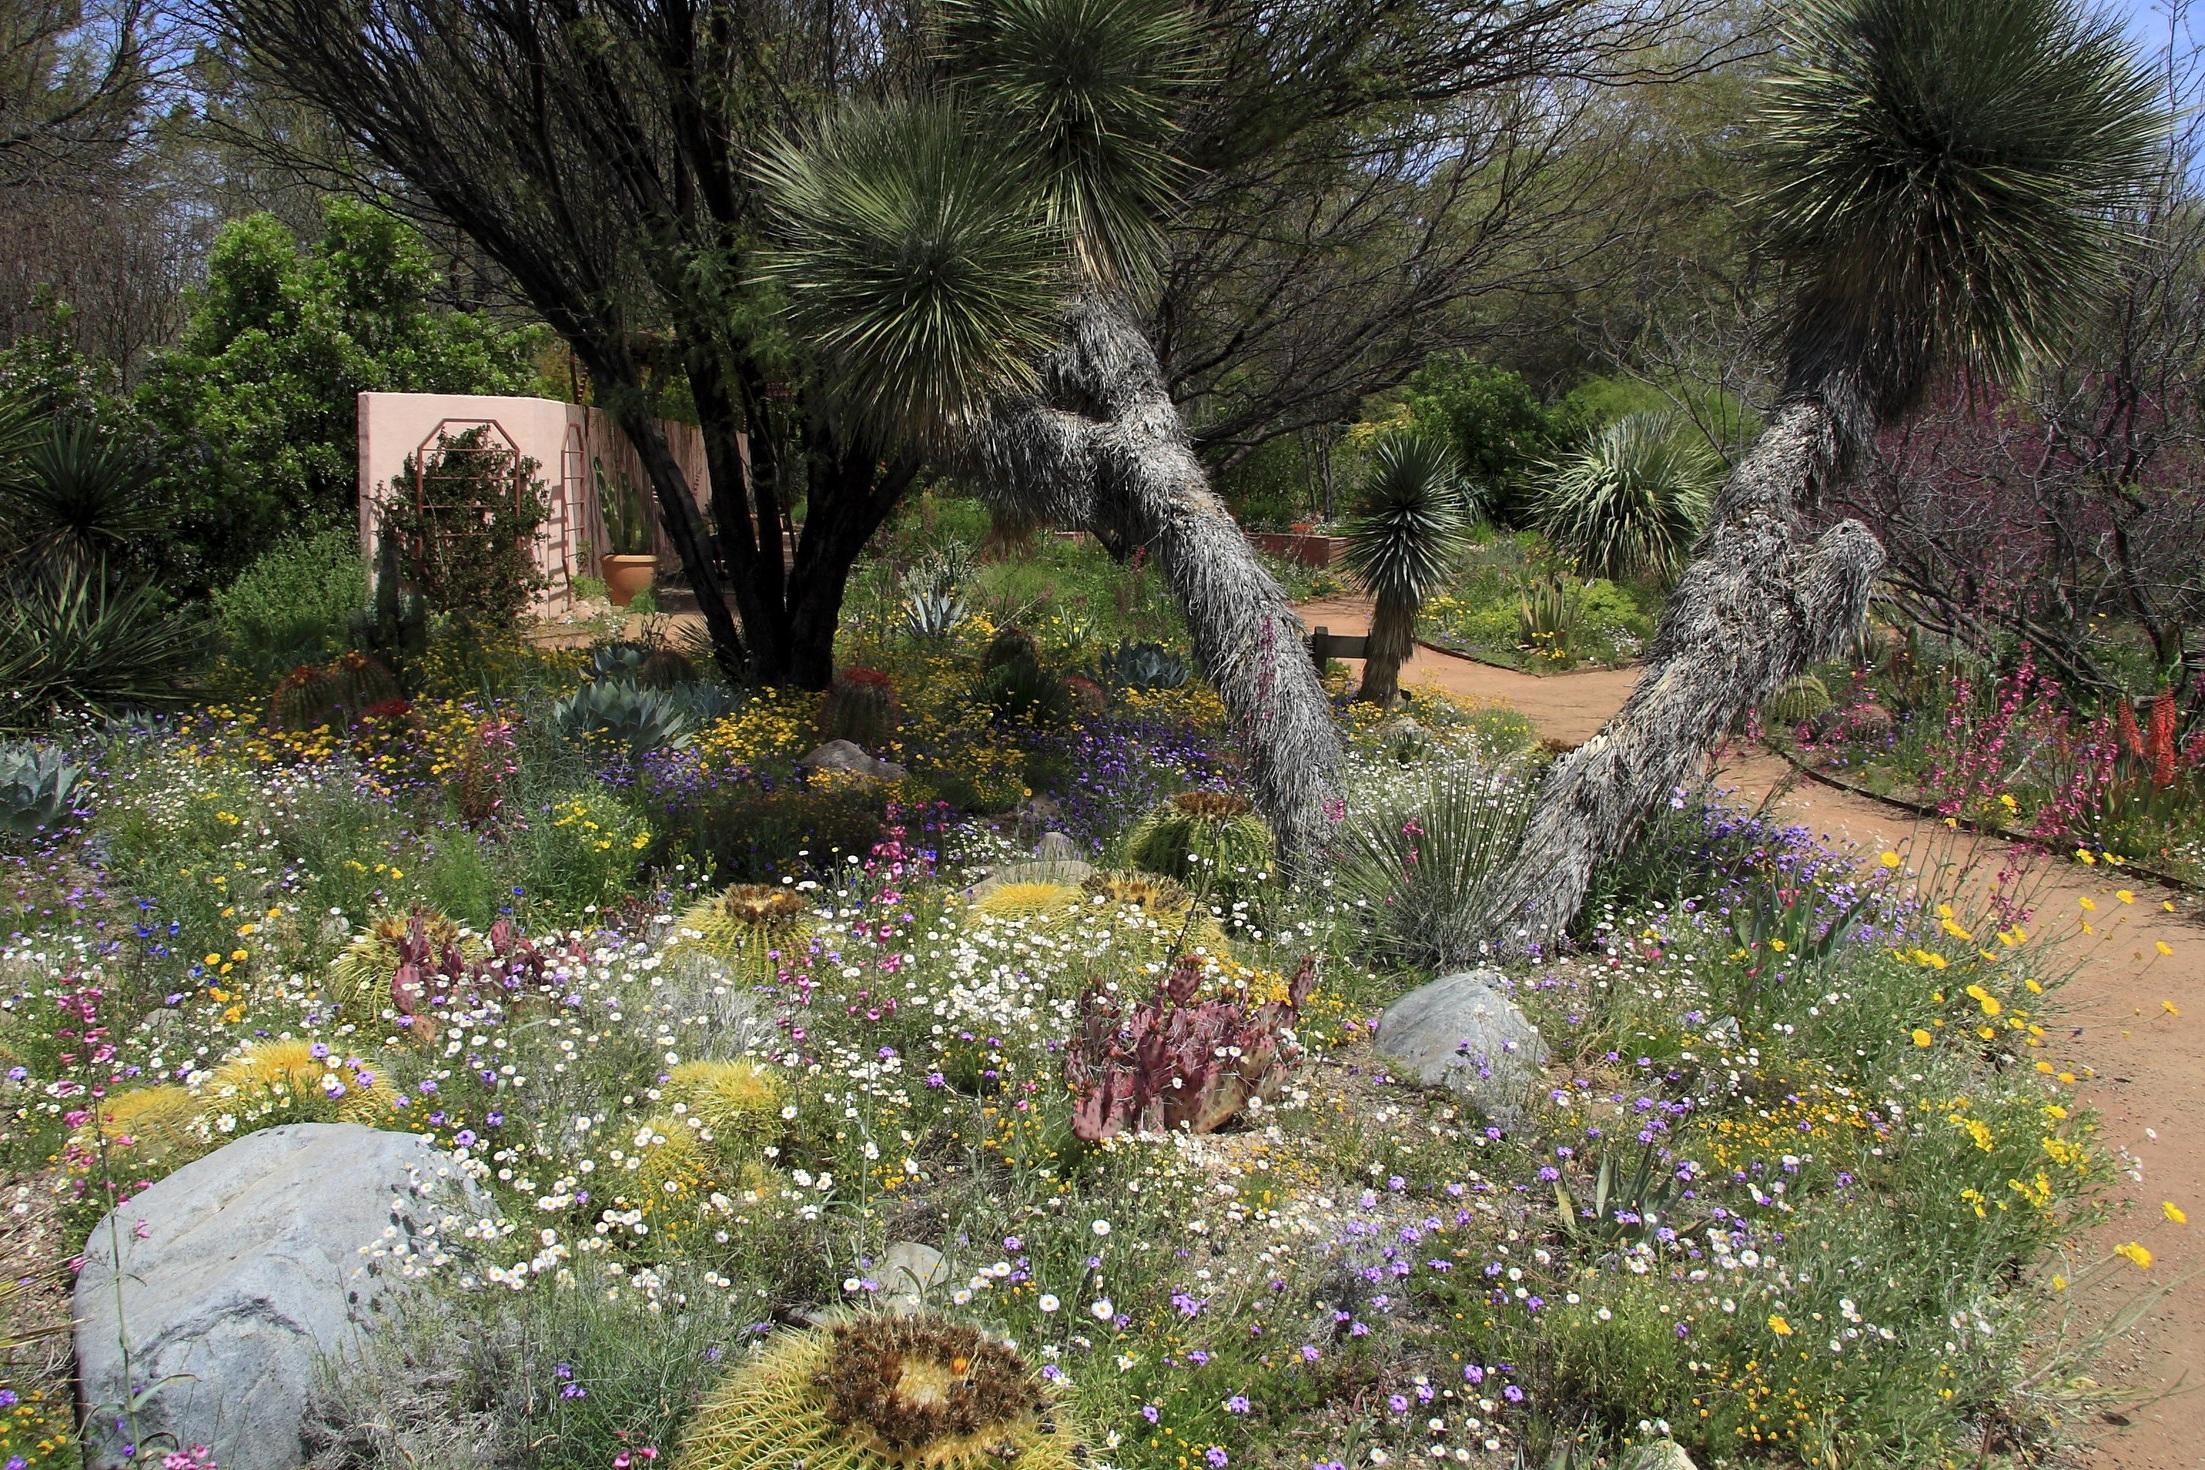 Boyce Thompson Arboretum - 37615 E US Highway #60, Superior, AZ 85173http://www.btarboretum.org/